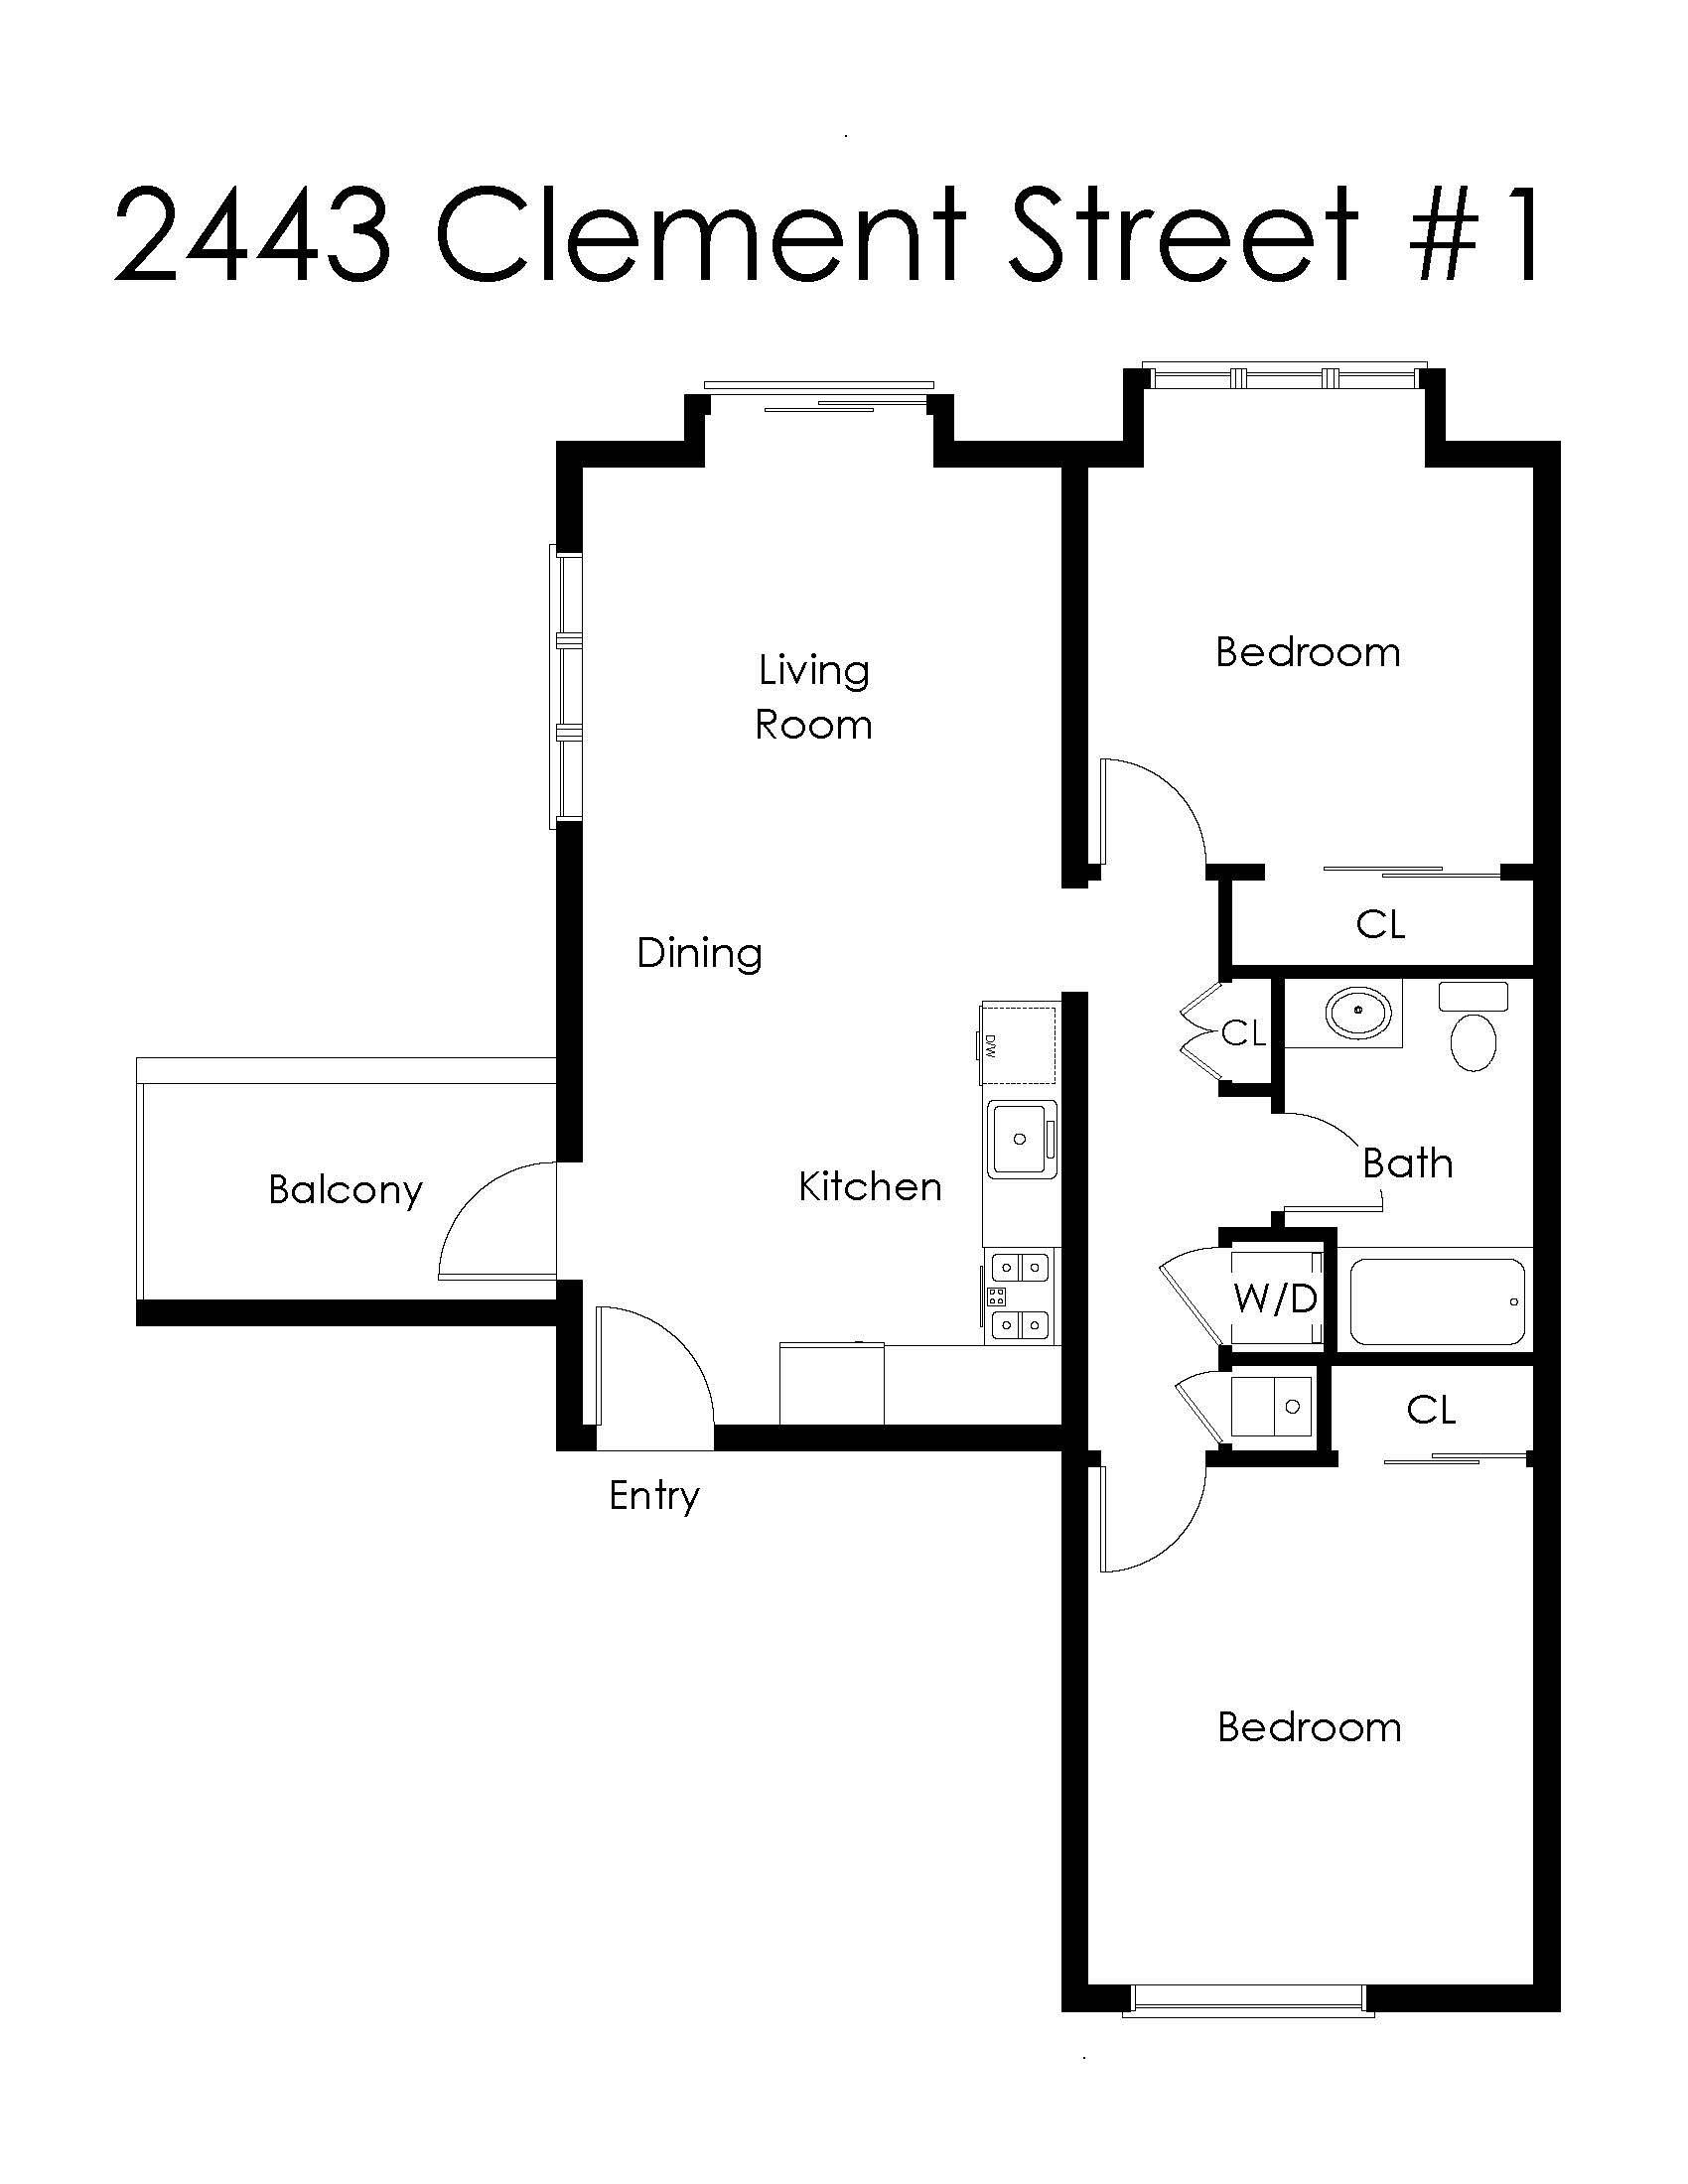 Chief Architect 8.0  2443 Clement Street #1 Vanguard M McHale.jpg